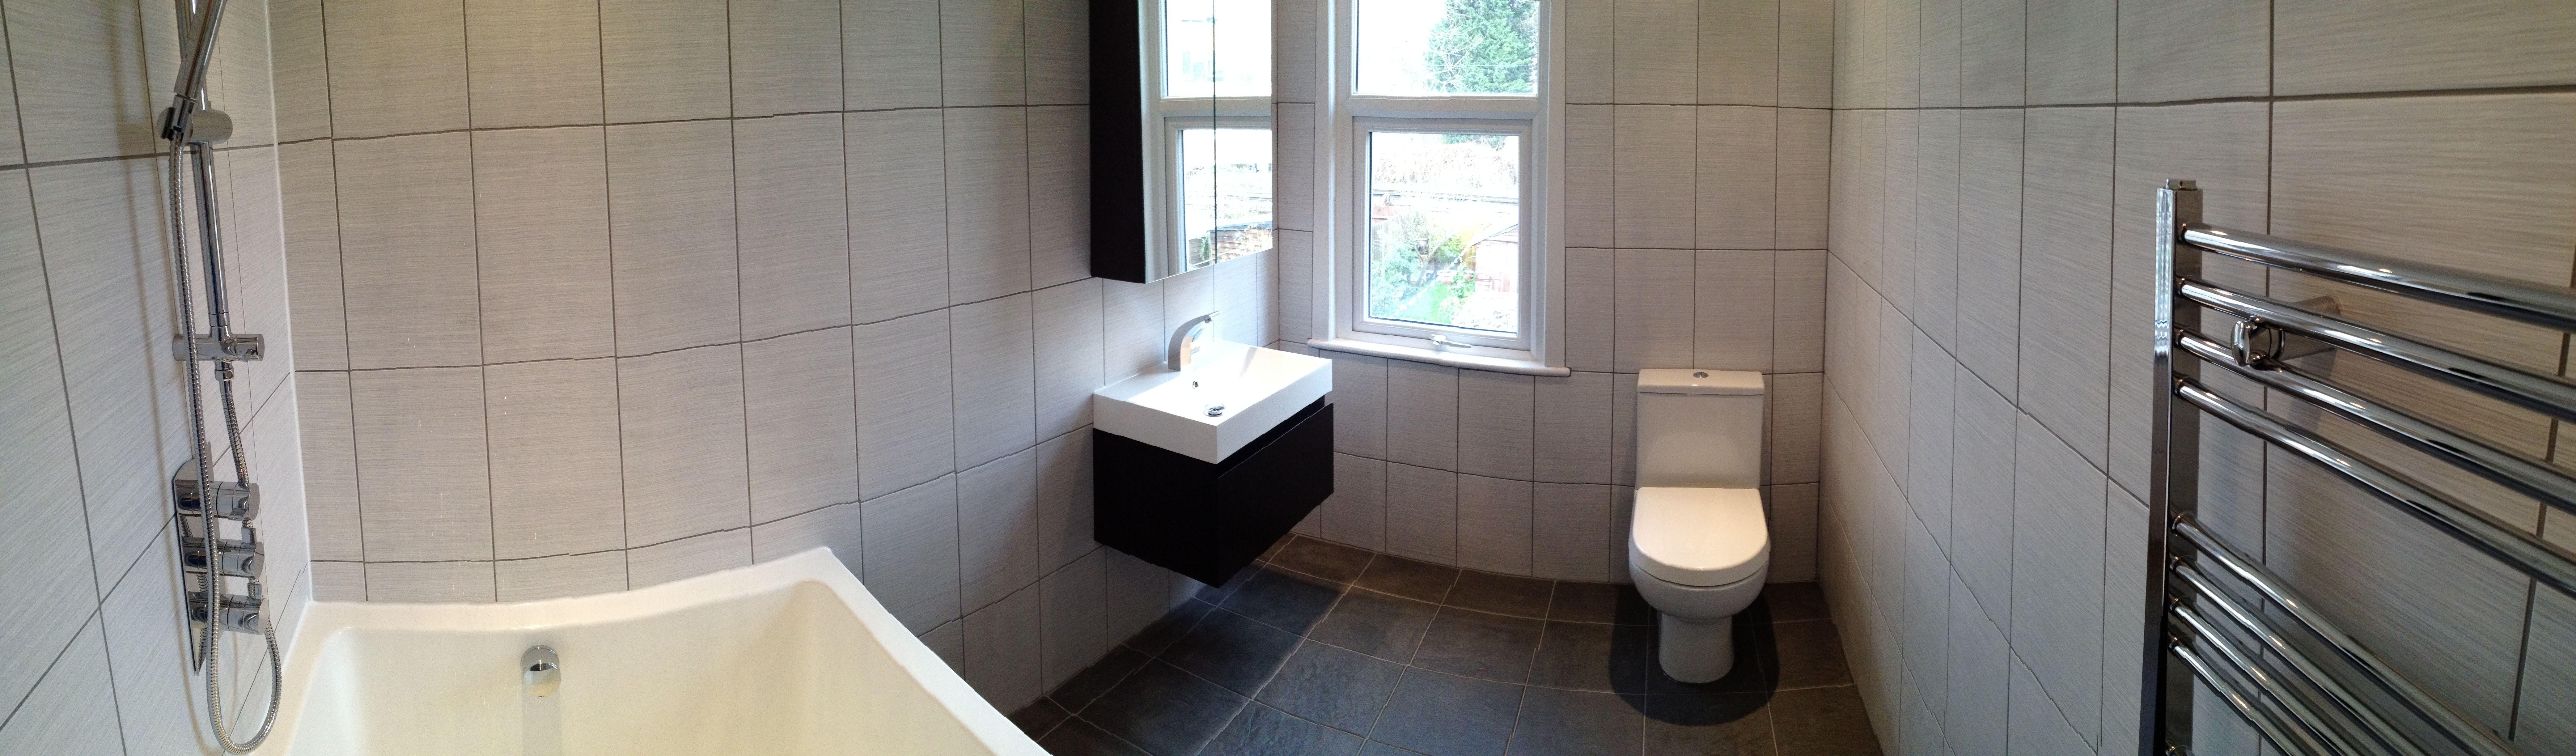 Uk Bathroom Design Bathroom Installedaquanero Bathroom Design & Installation Www